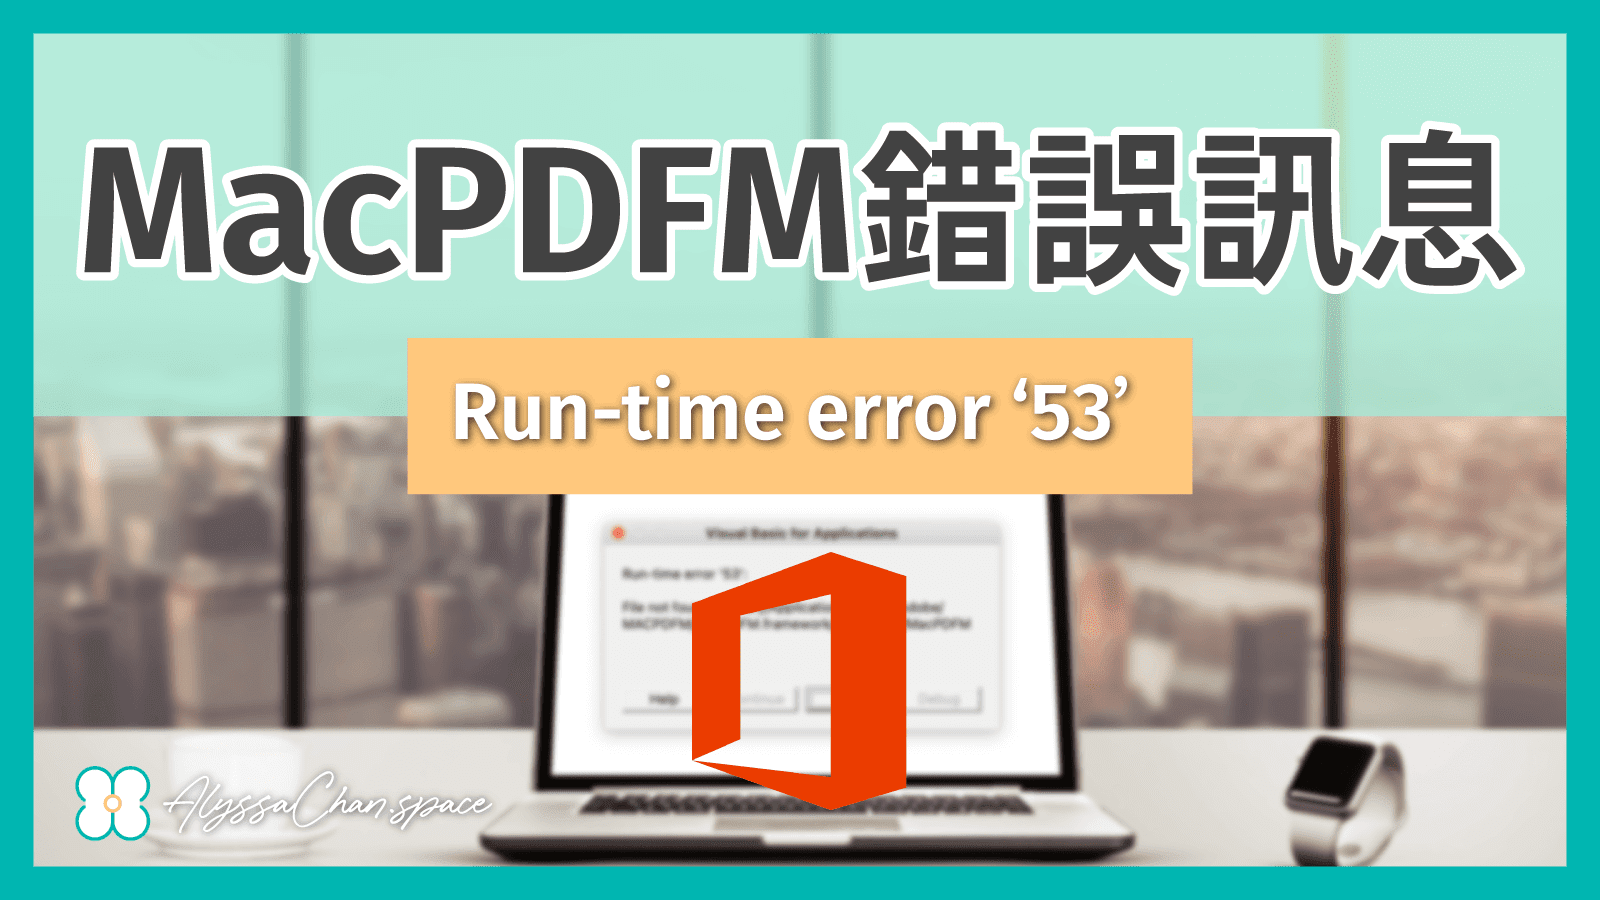 解決 MS Office Run-time error '53' (MacPDFM) 錯誤